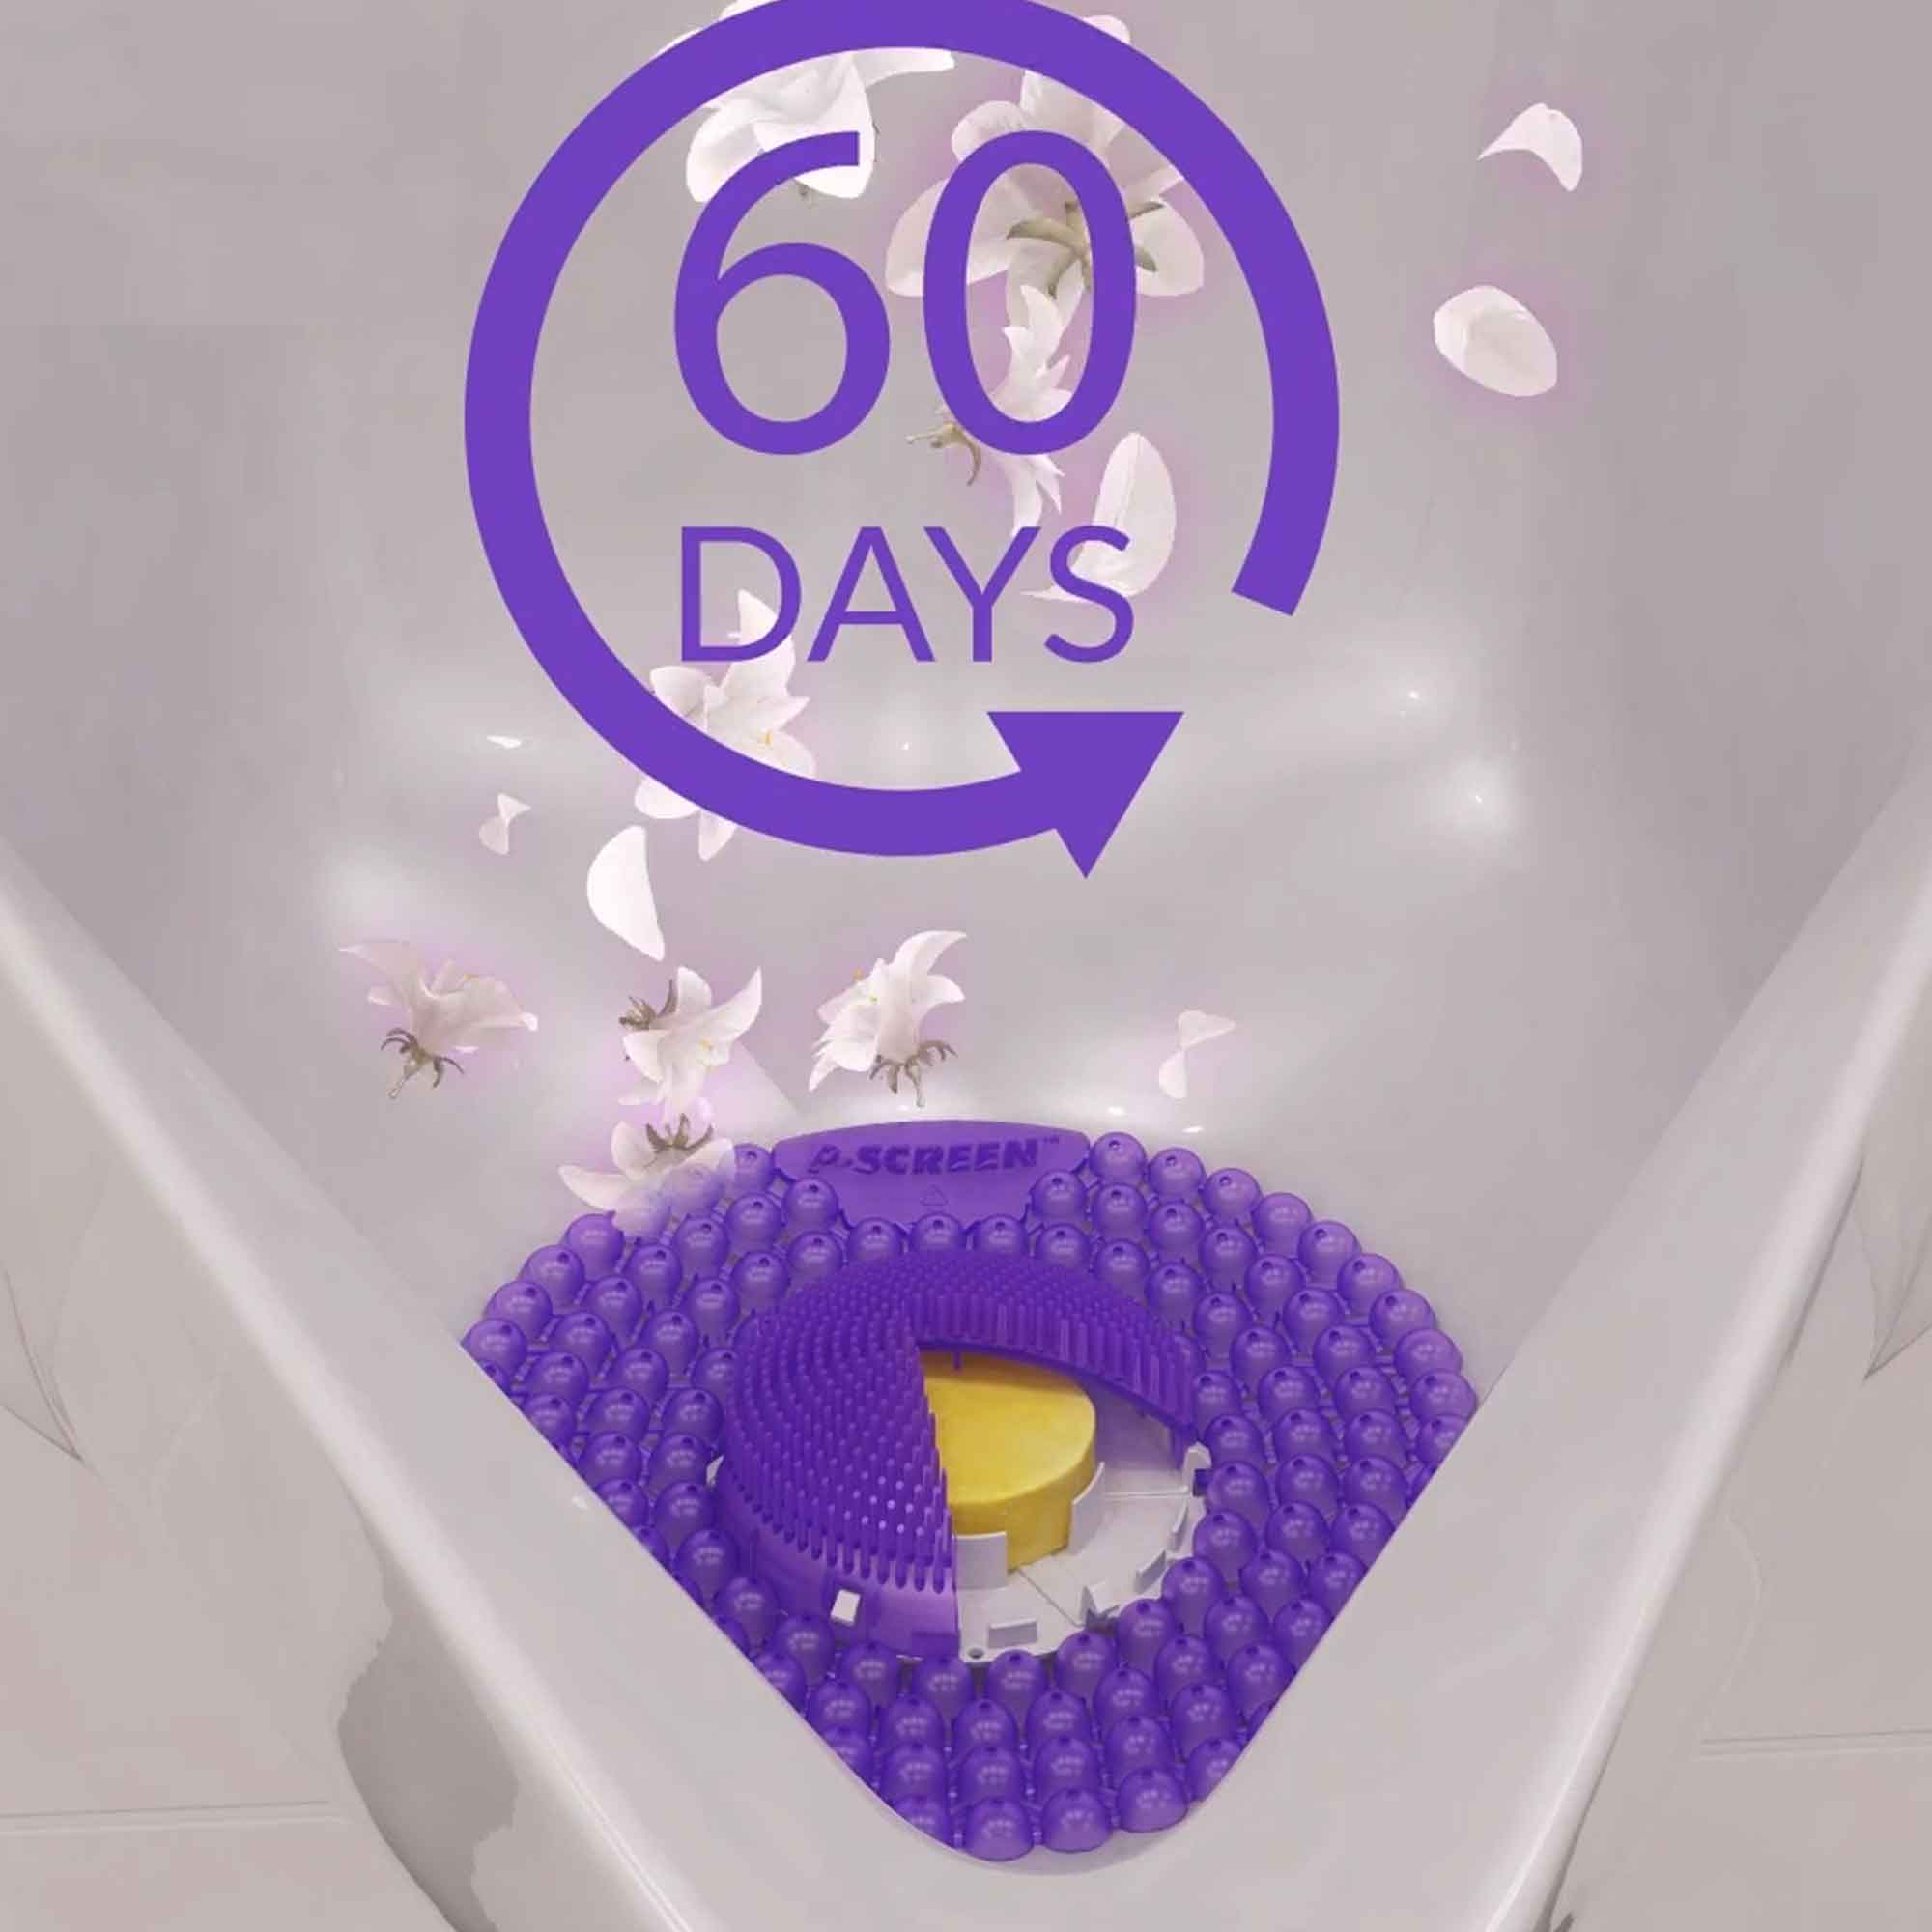 P-Screen® 60 Day Urinal Screen Lavender & Geranium cutaway - ISSA innovation